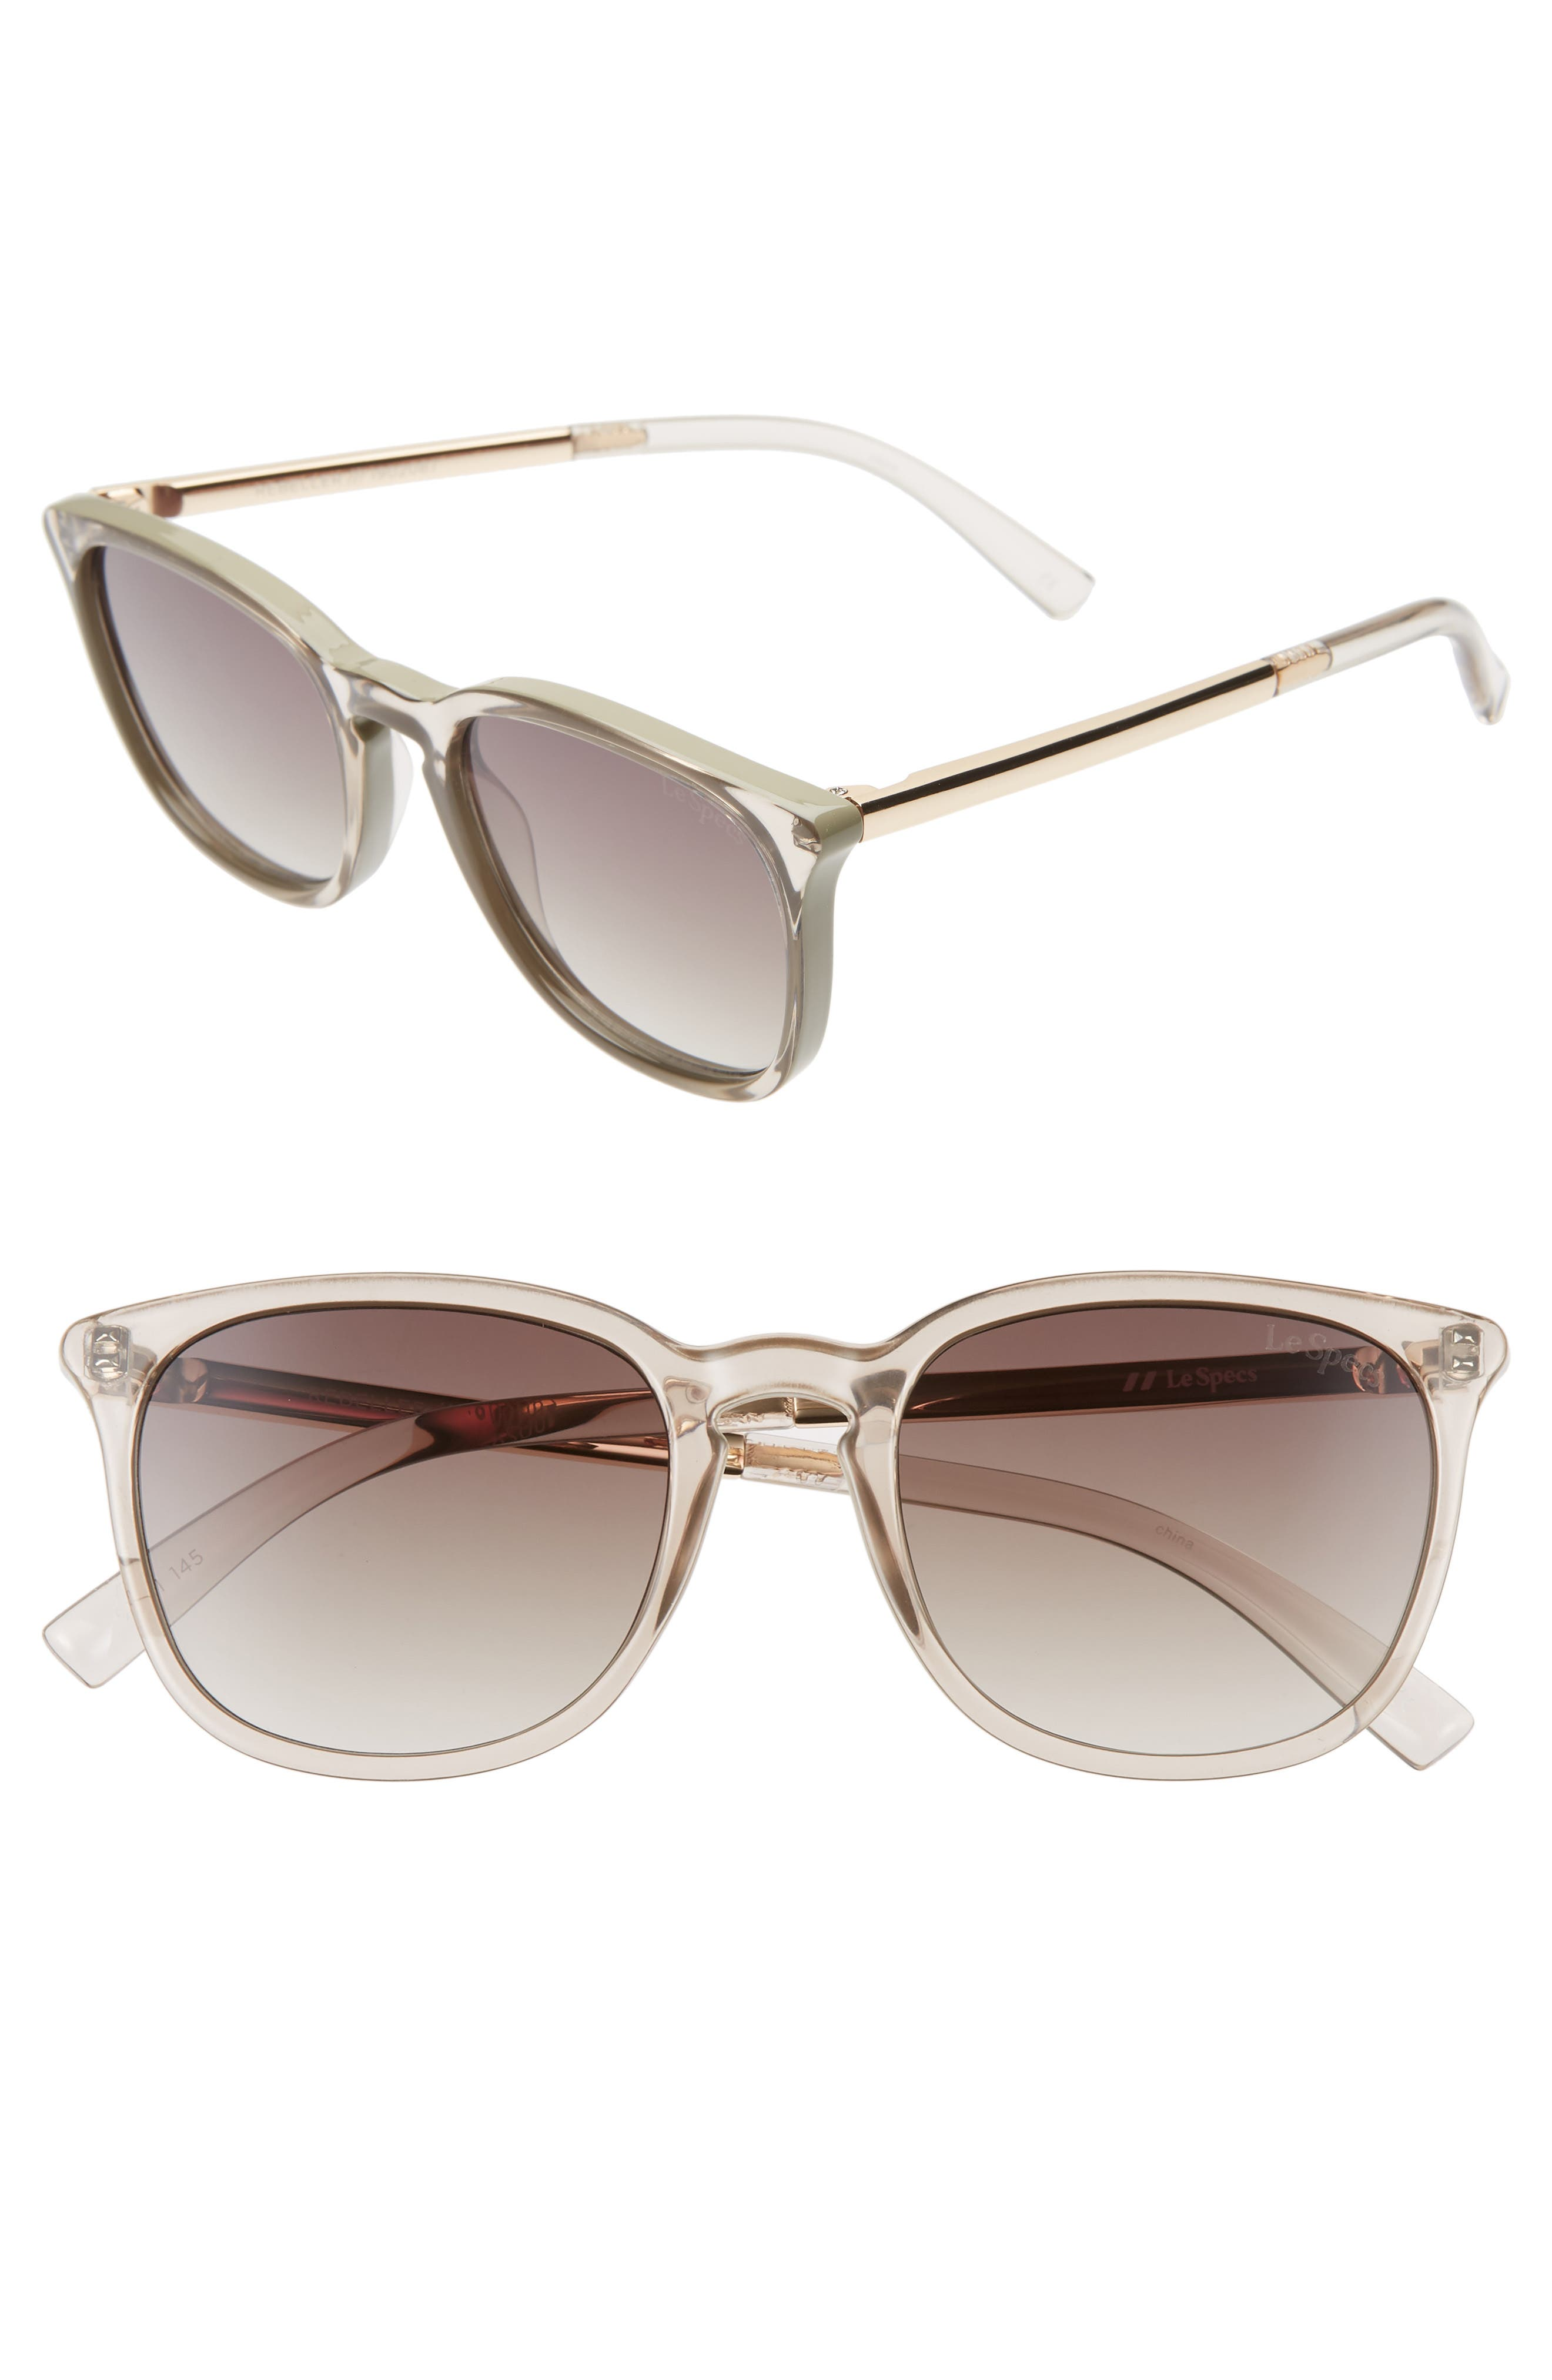 Le Specs Rebeller 5m Round Sunglasses - Stone/ Khaki Gradient